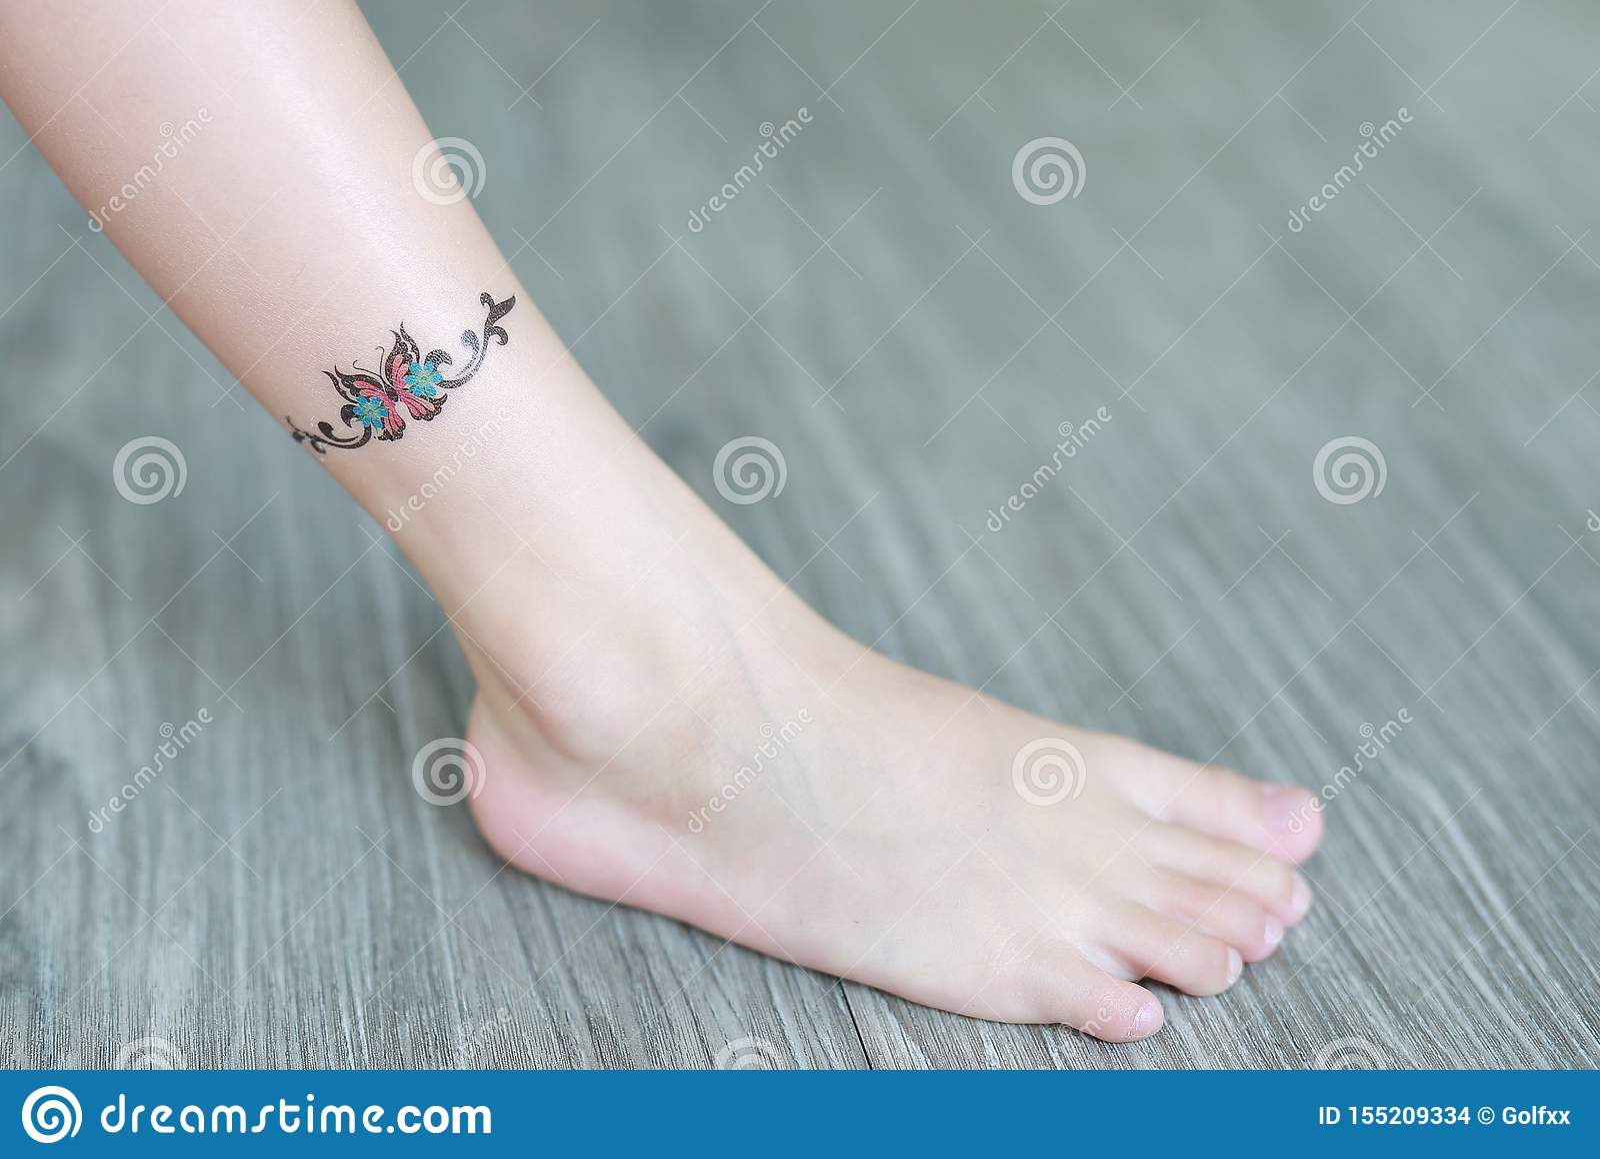 Small Flower Tattoo Sticker On Child Ankle Dress Up Tattoos Stock Photo Image Of Female Elegant 155209334